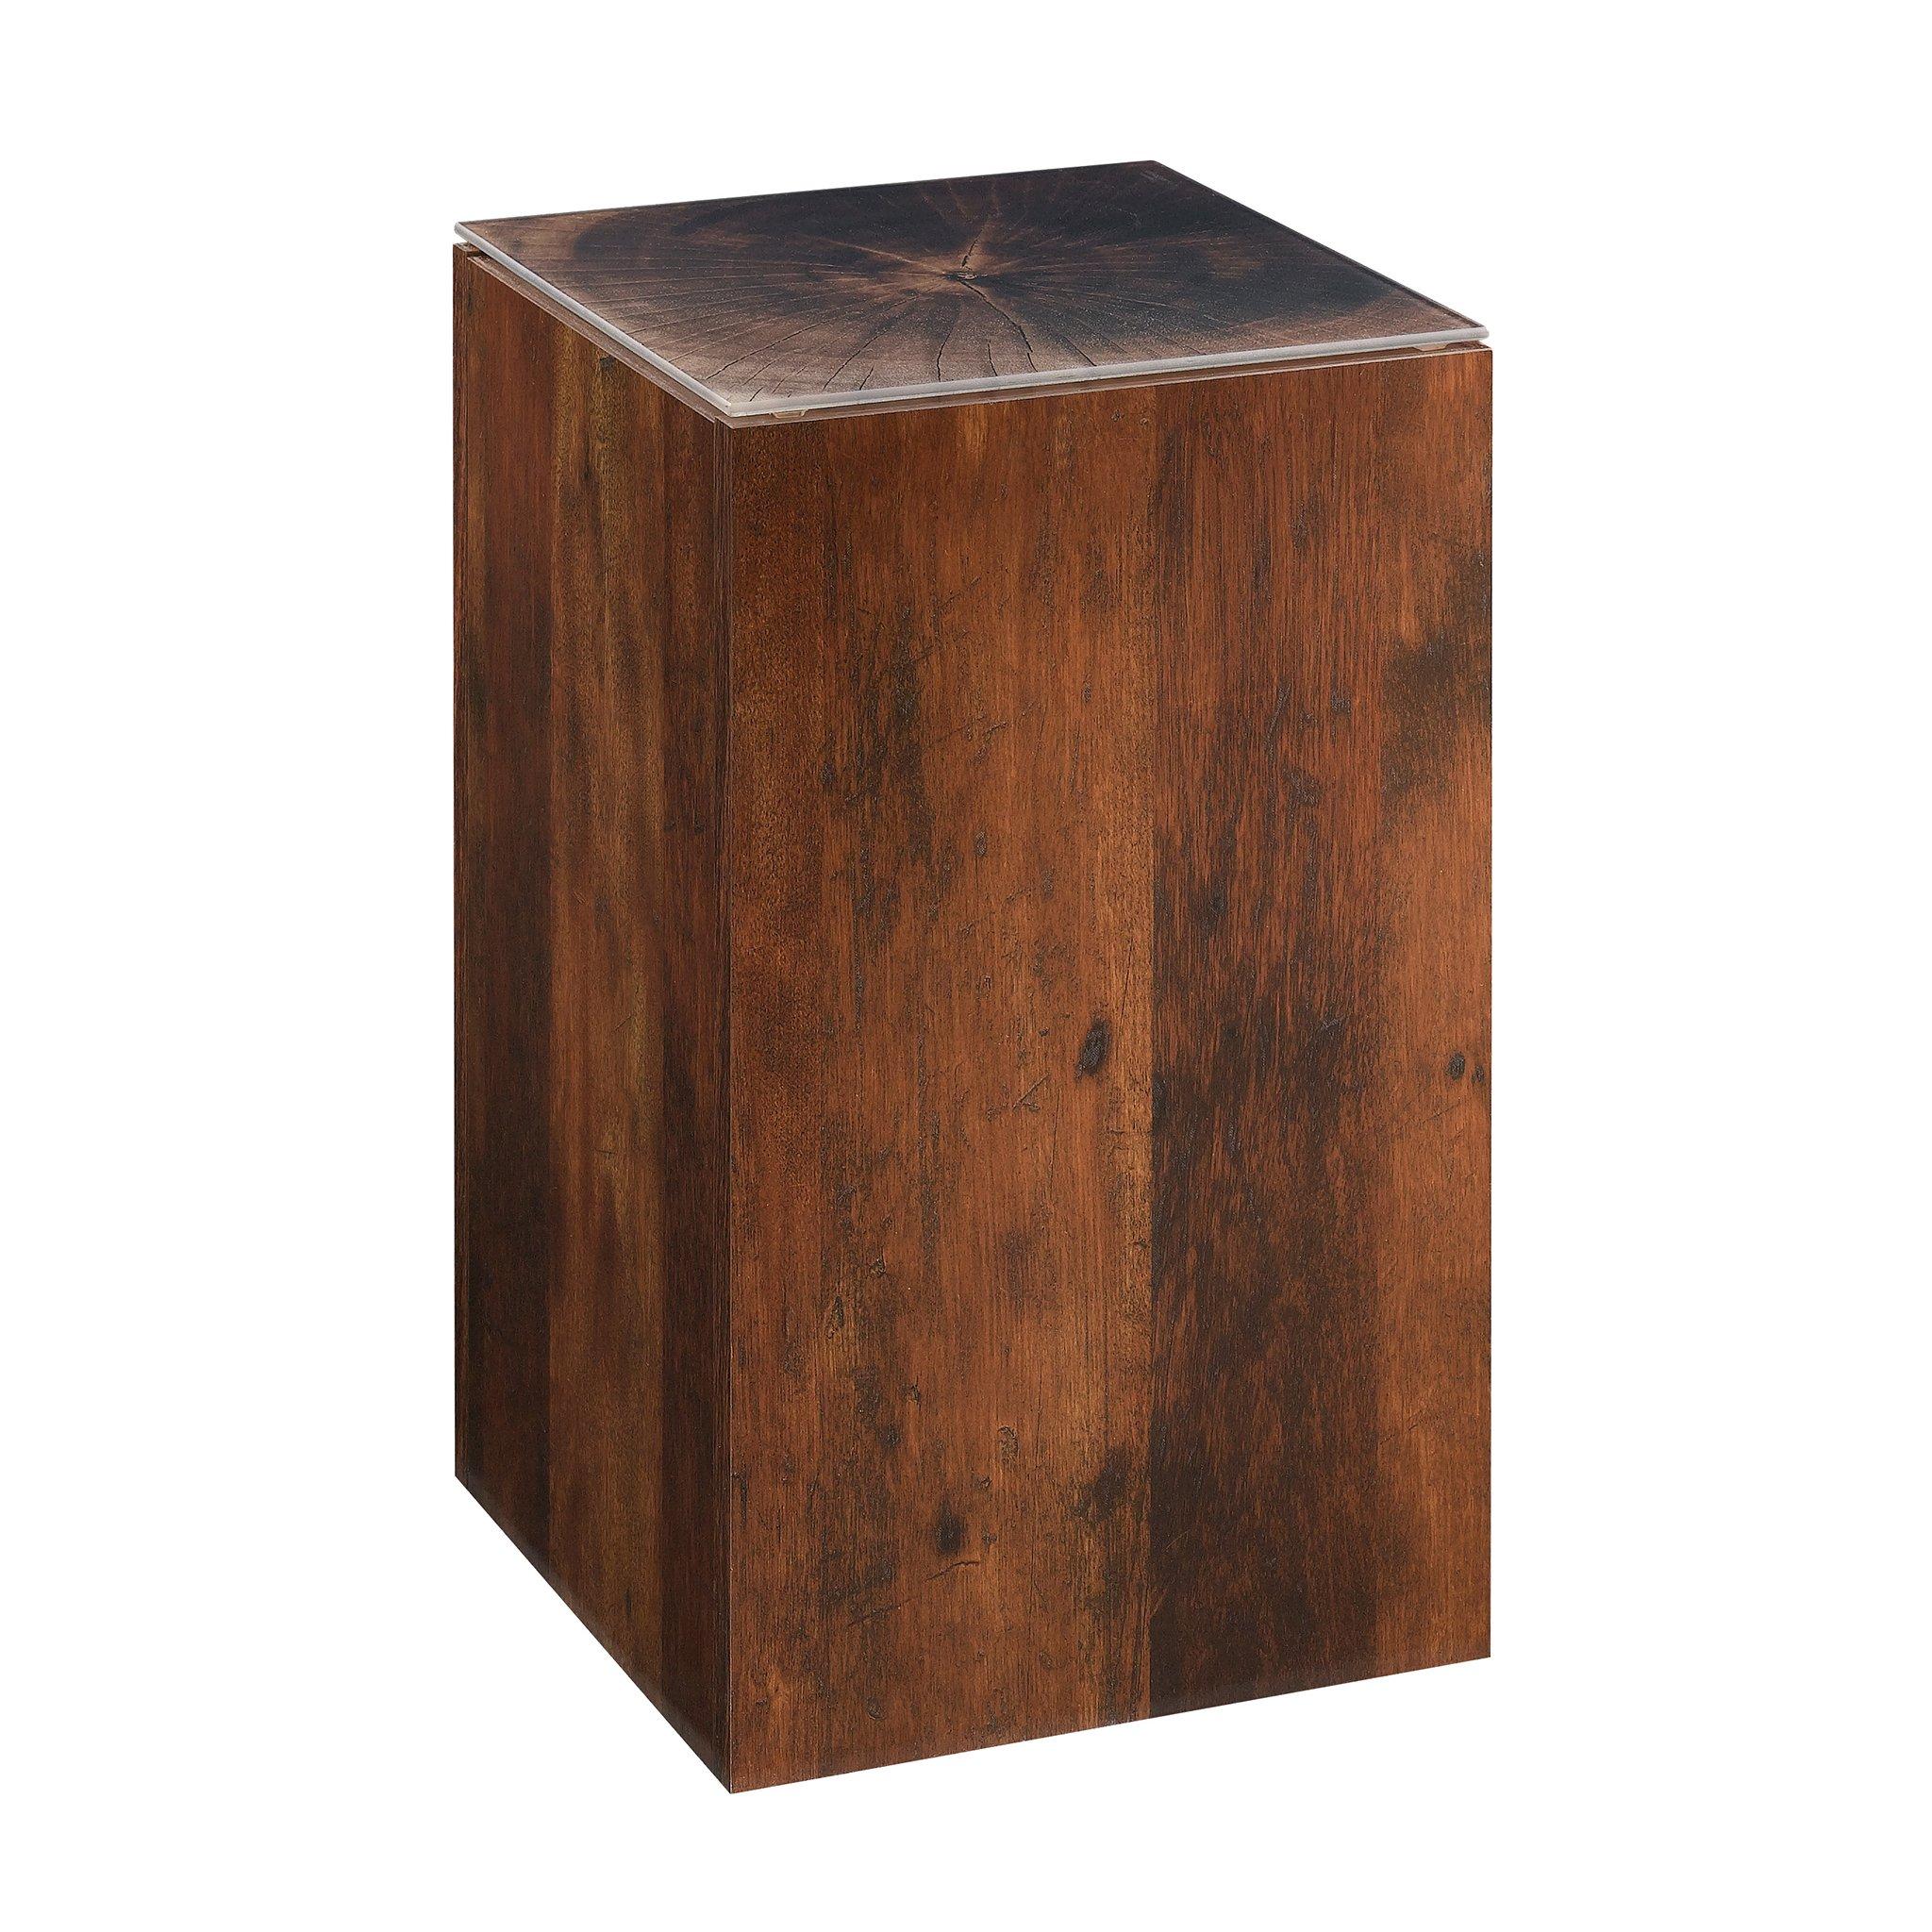 Sauder (SAUDB) 420126 Side Table, Curado Cherry